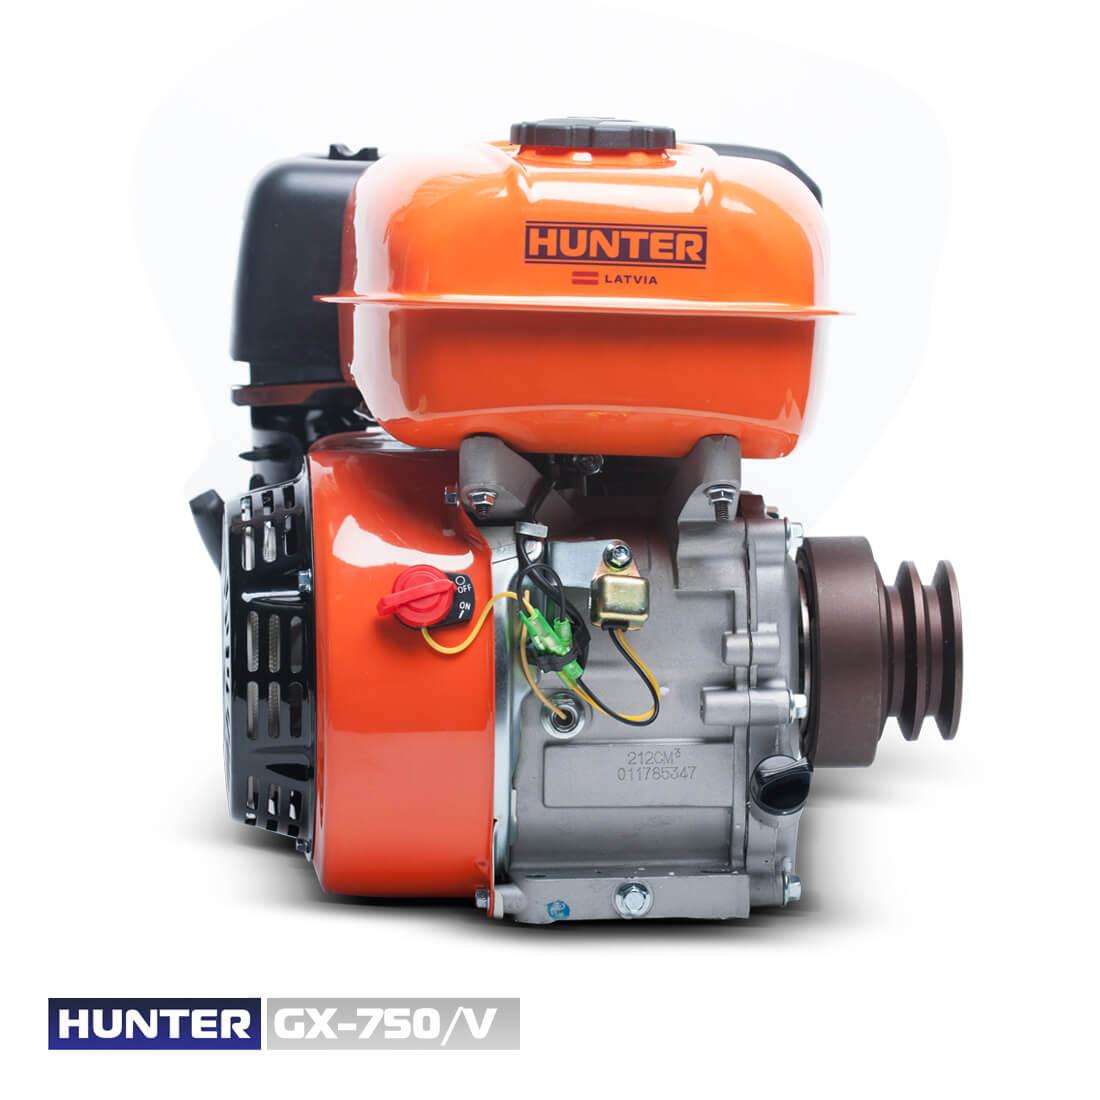 Фото GX-750/V цена 5000грн №5 — Hunter